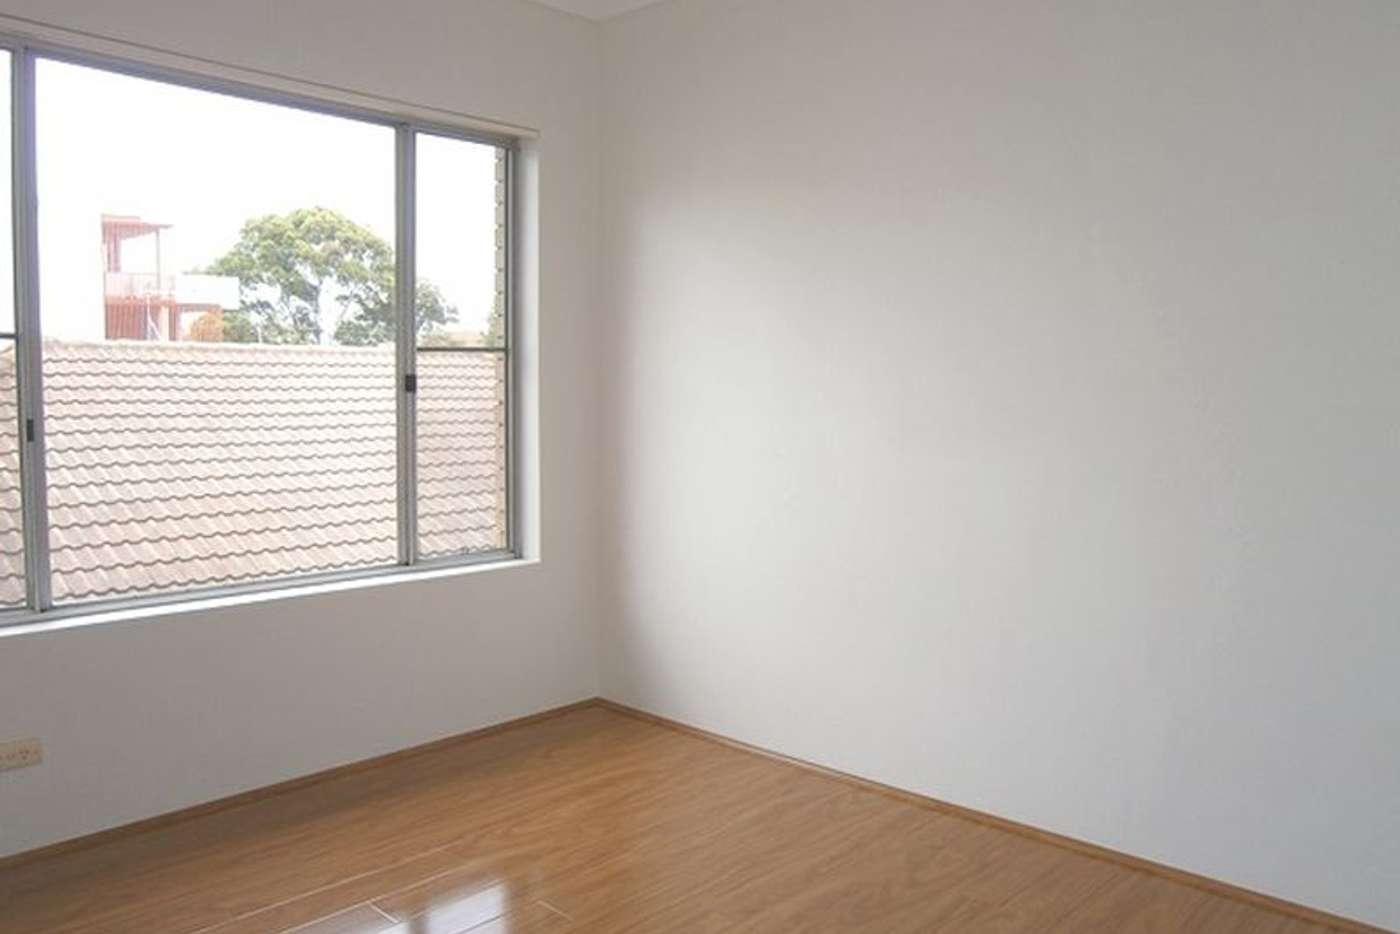 Sixth view of Homely unit listing, 6/50 Chapel Street, Kogarah NSW 2217